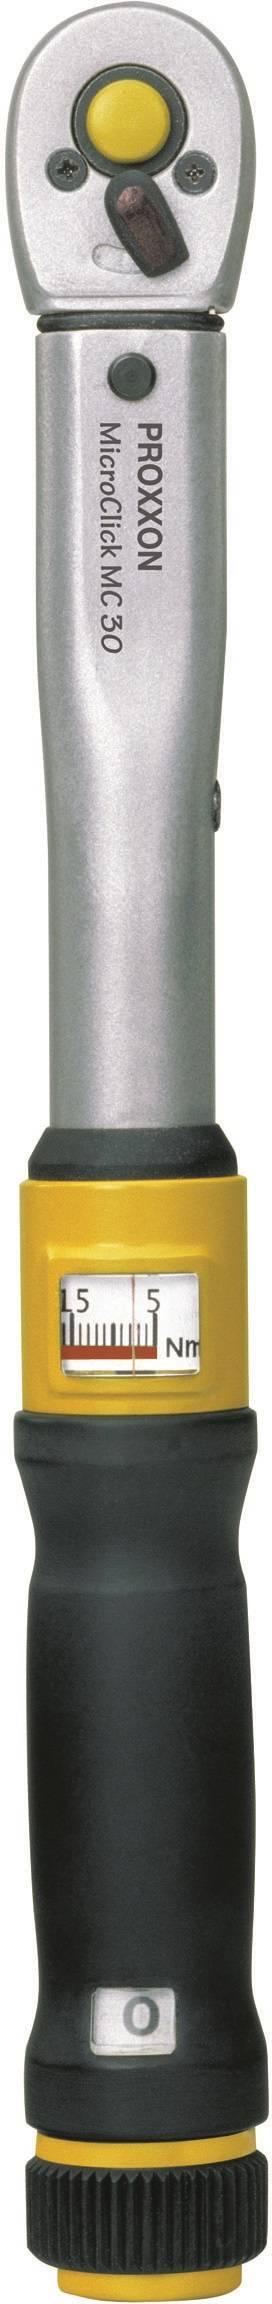 Momentový klíč Proxxon Industrial, 23349, 6,3 mm, 6 - 30 Nm